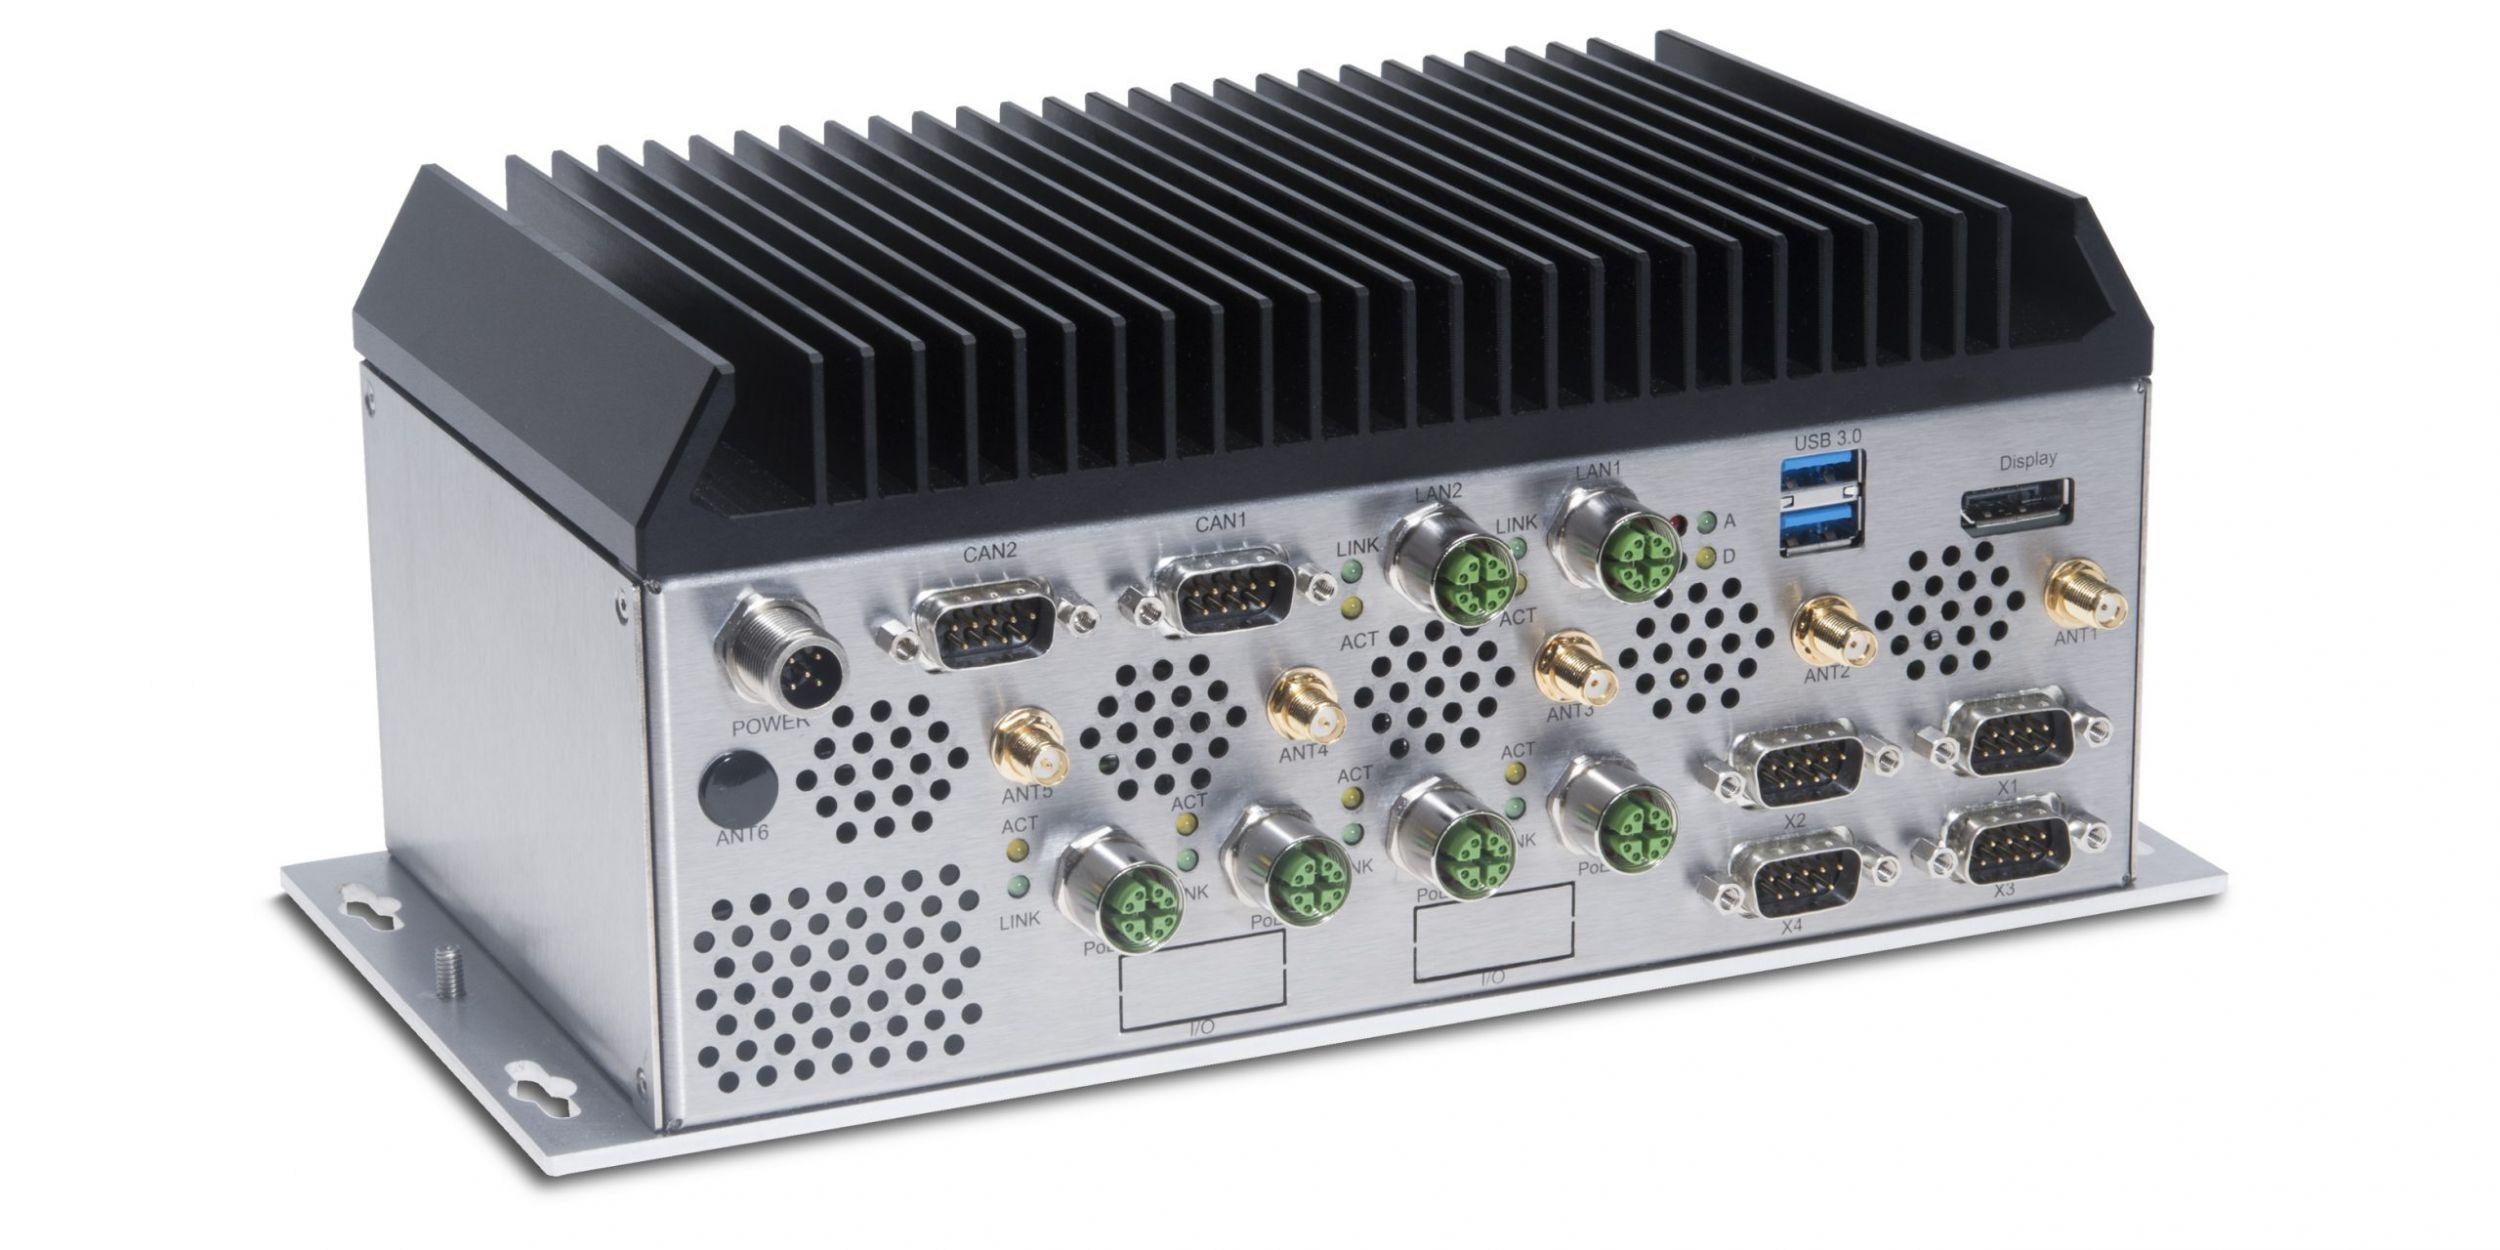 KI-fähiger Industrie-PC auf Nvidia-Basis